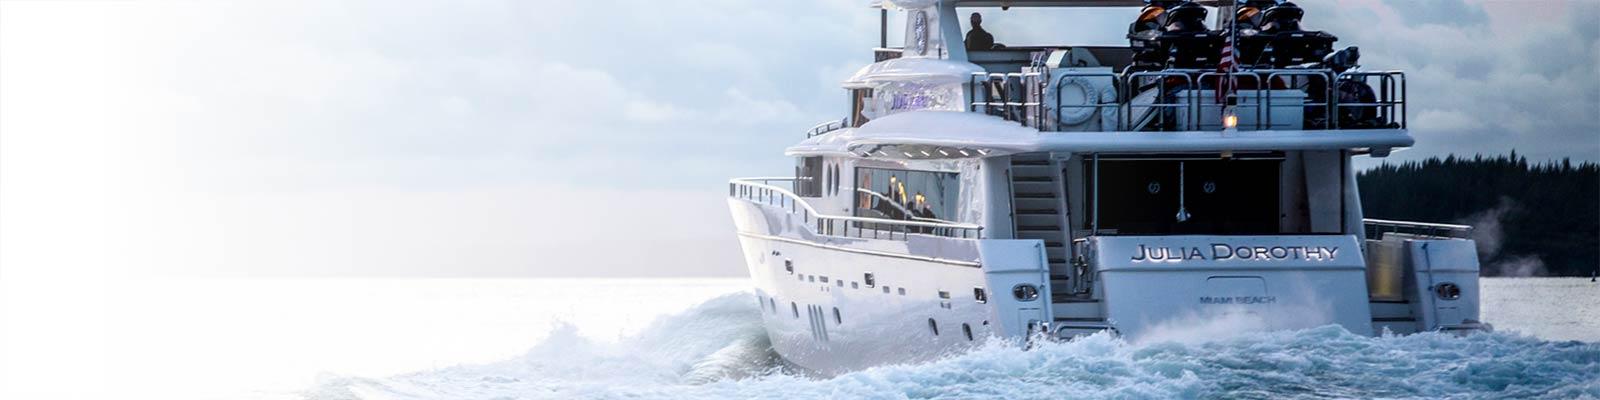 Luxury yacht leaving port.